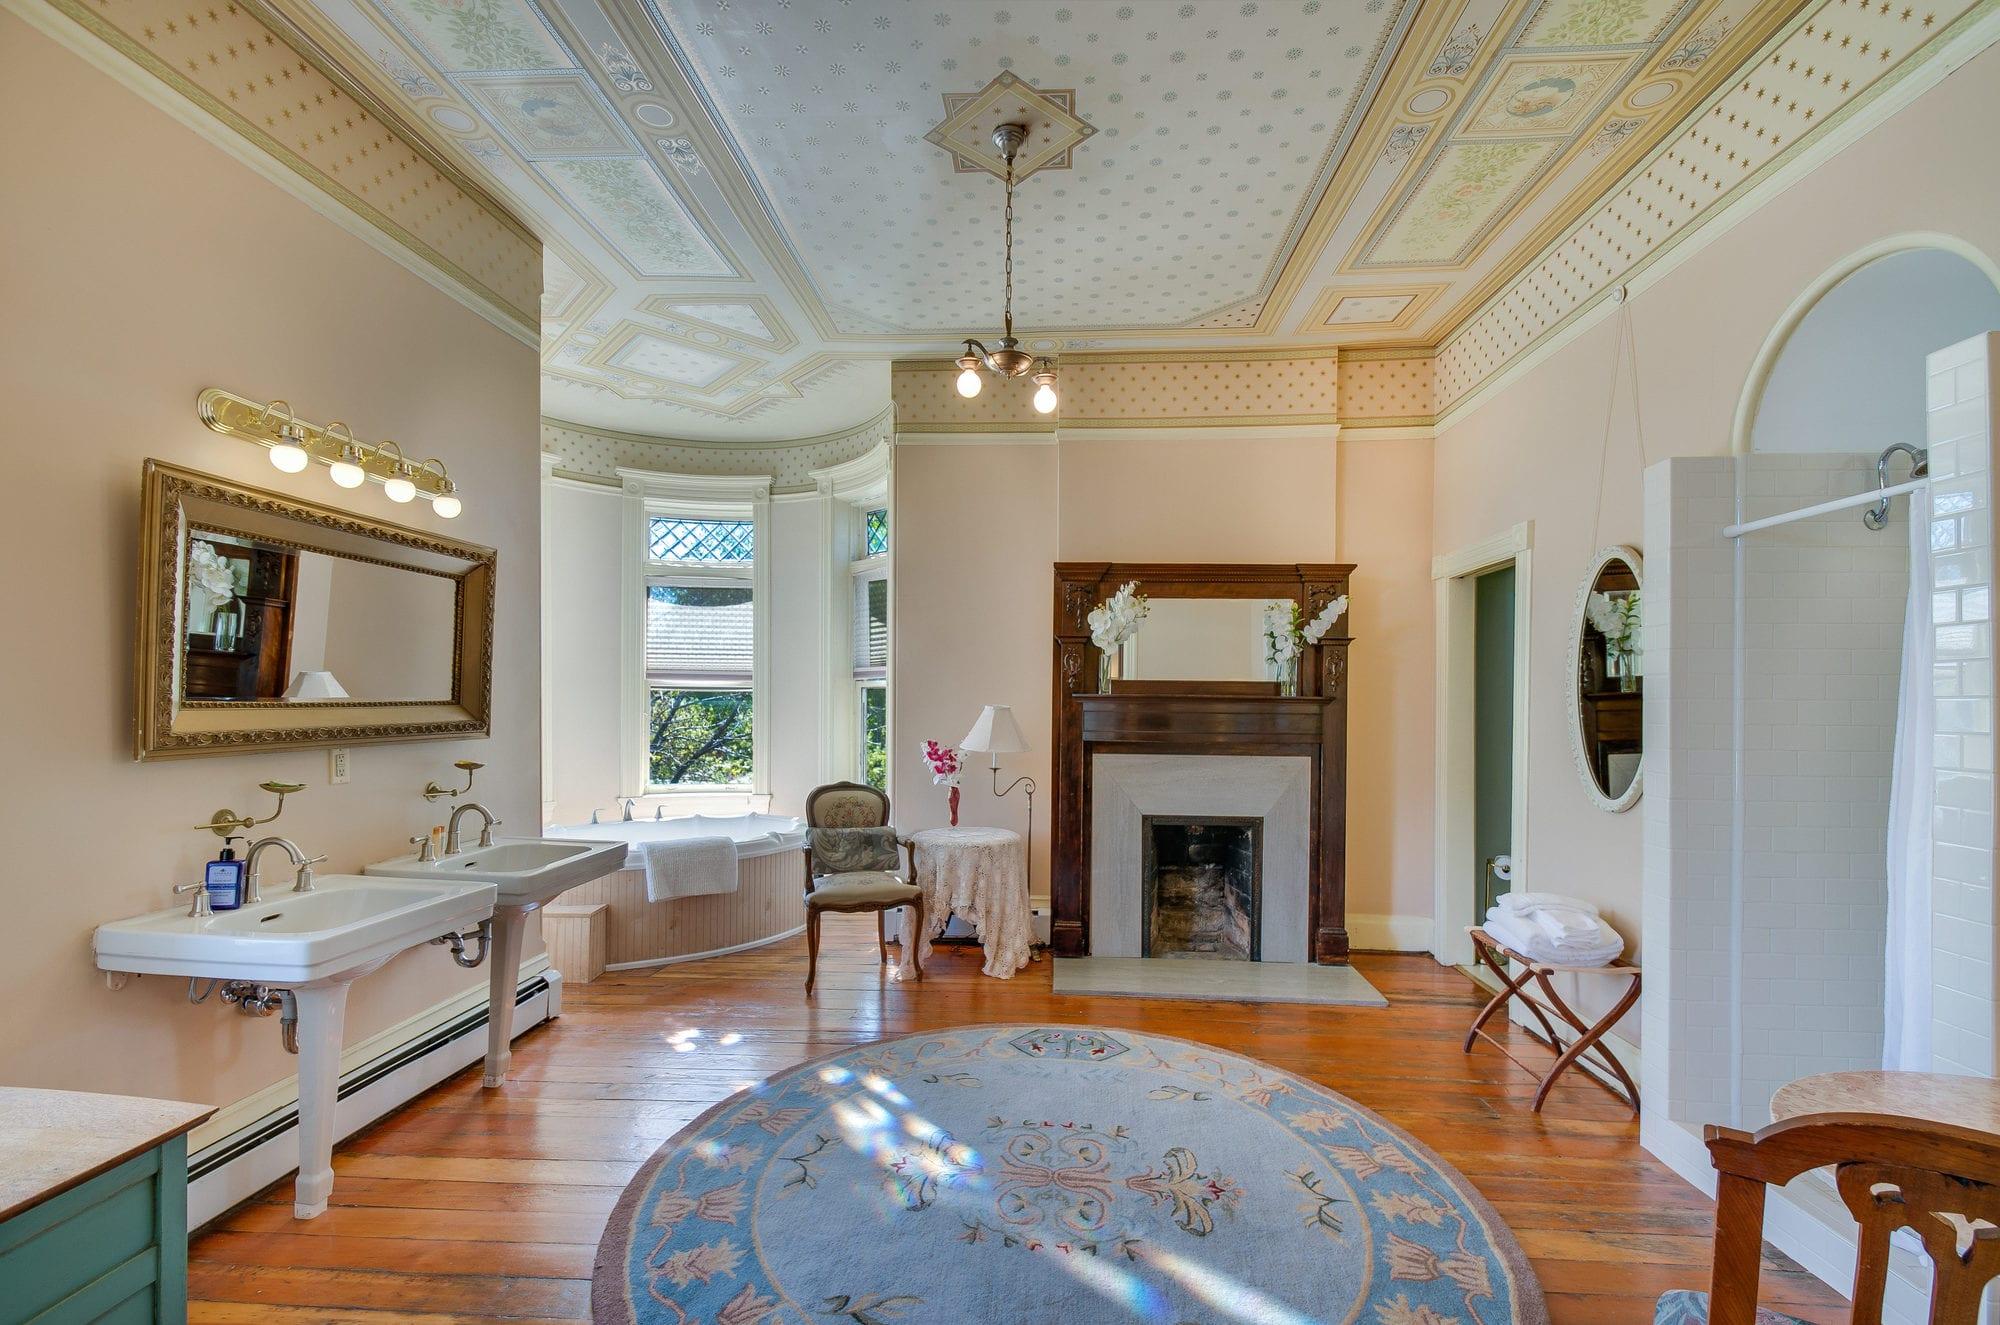 image of honeymoon suite at lumber baron inn denver